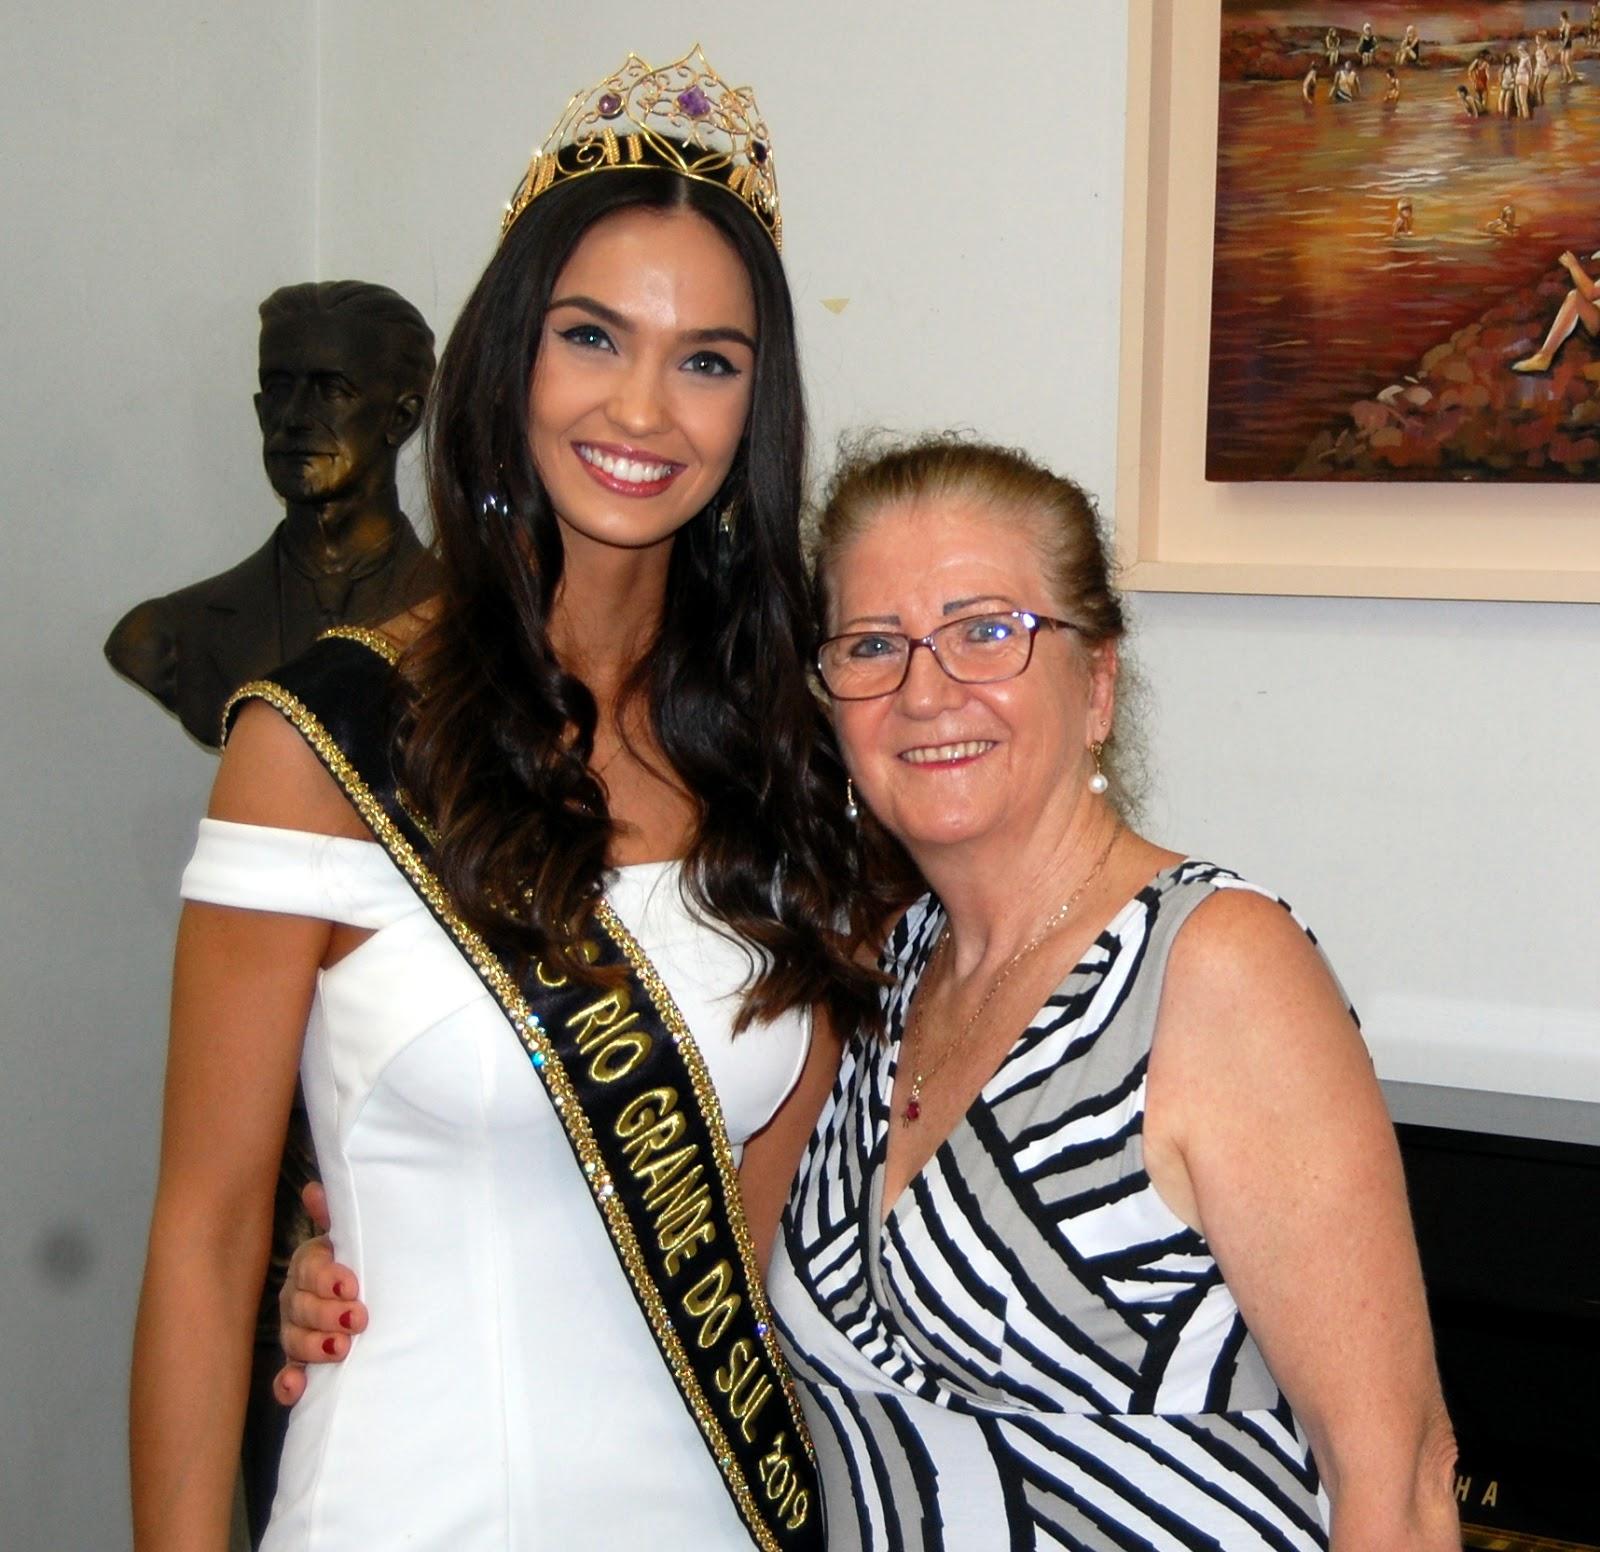 bianca scheren, top 5 de miss brasil universo 2019. - Página 5 Dsc_0014